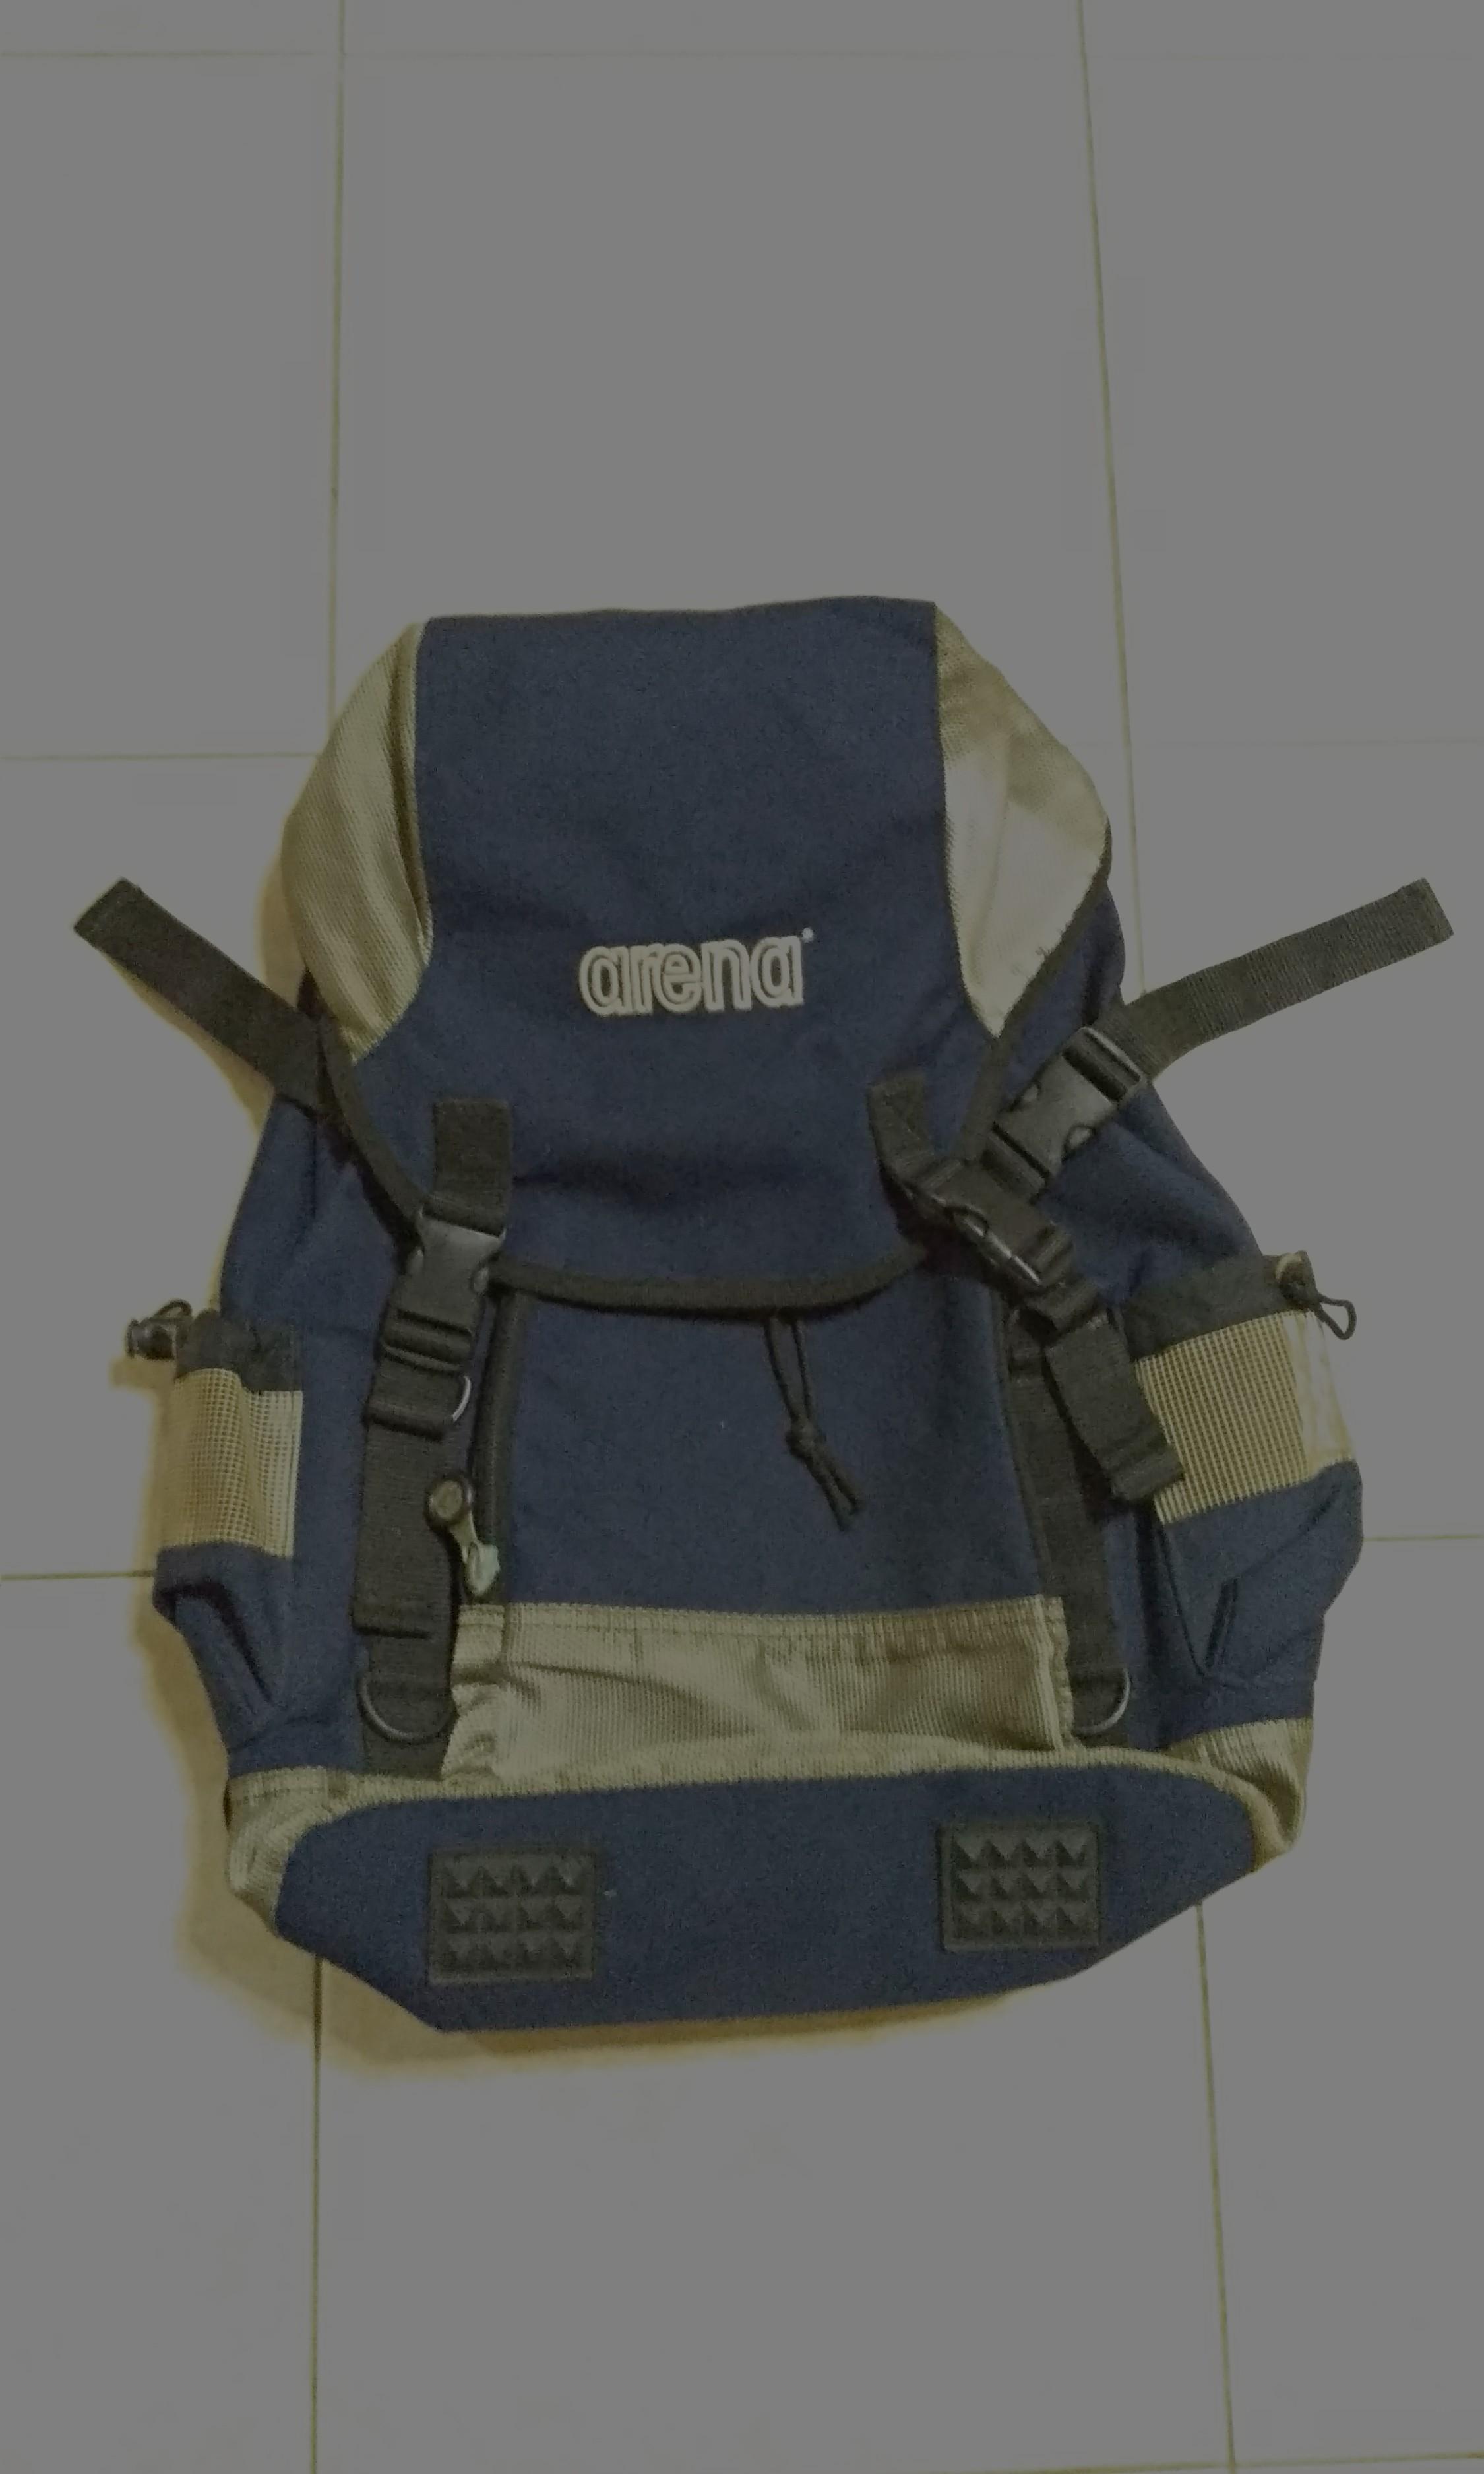 ARENA Backpack